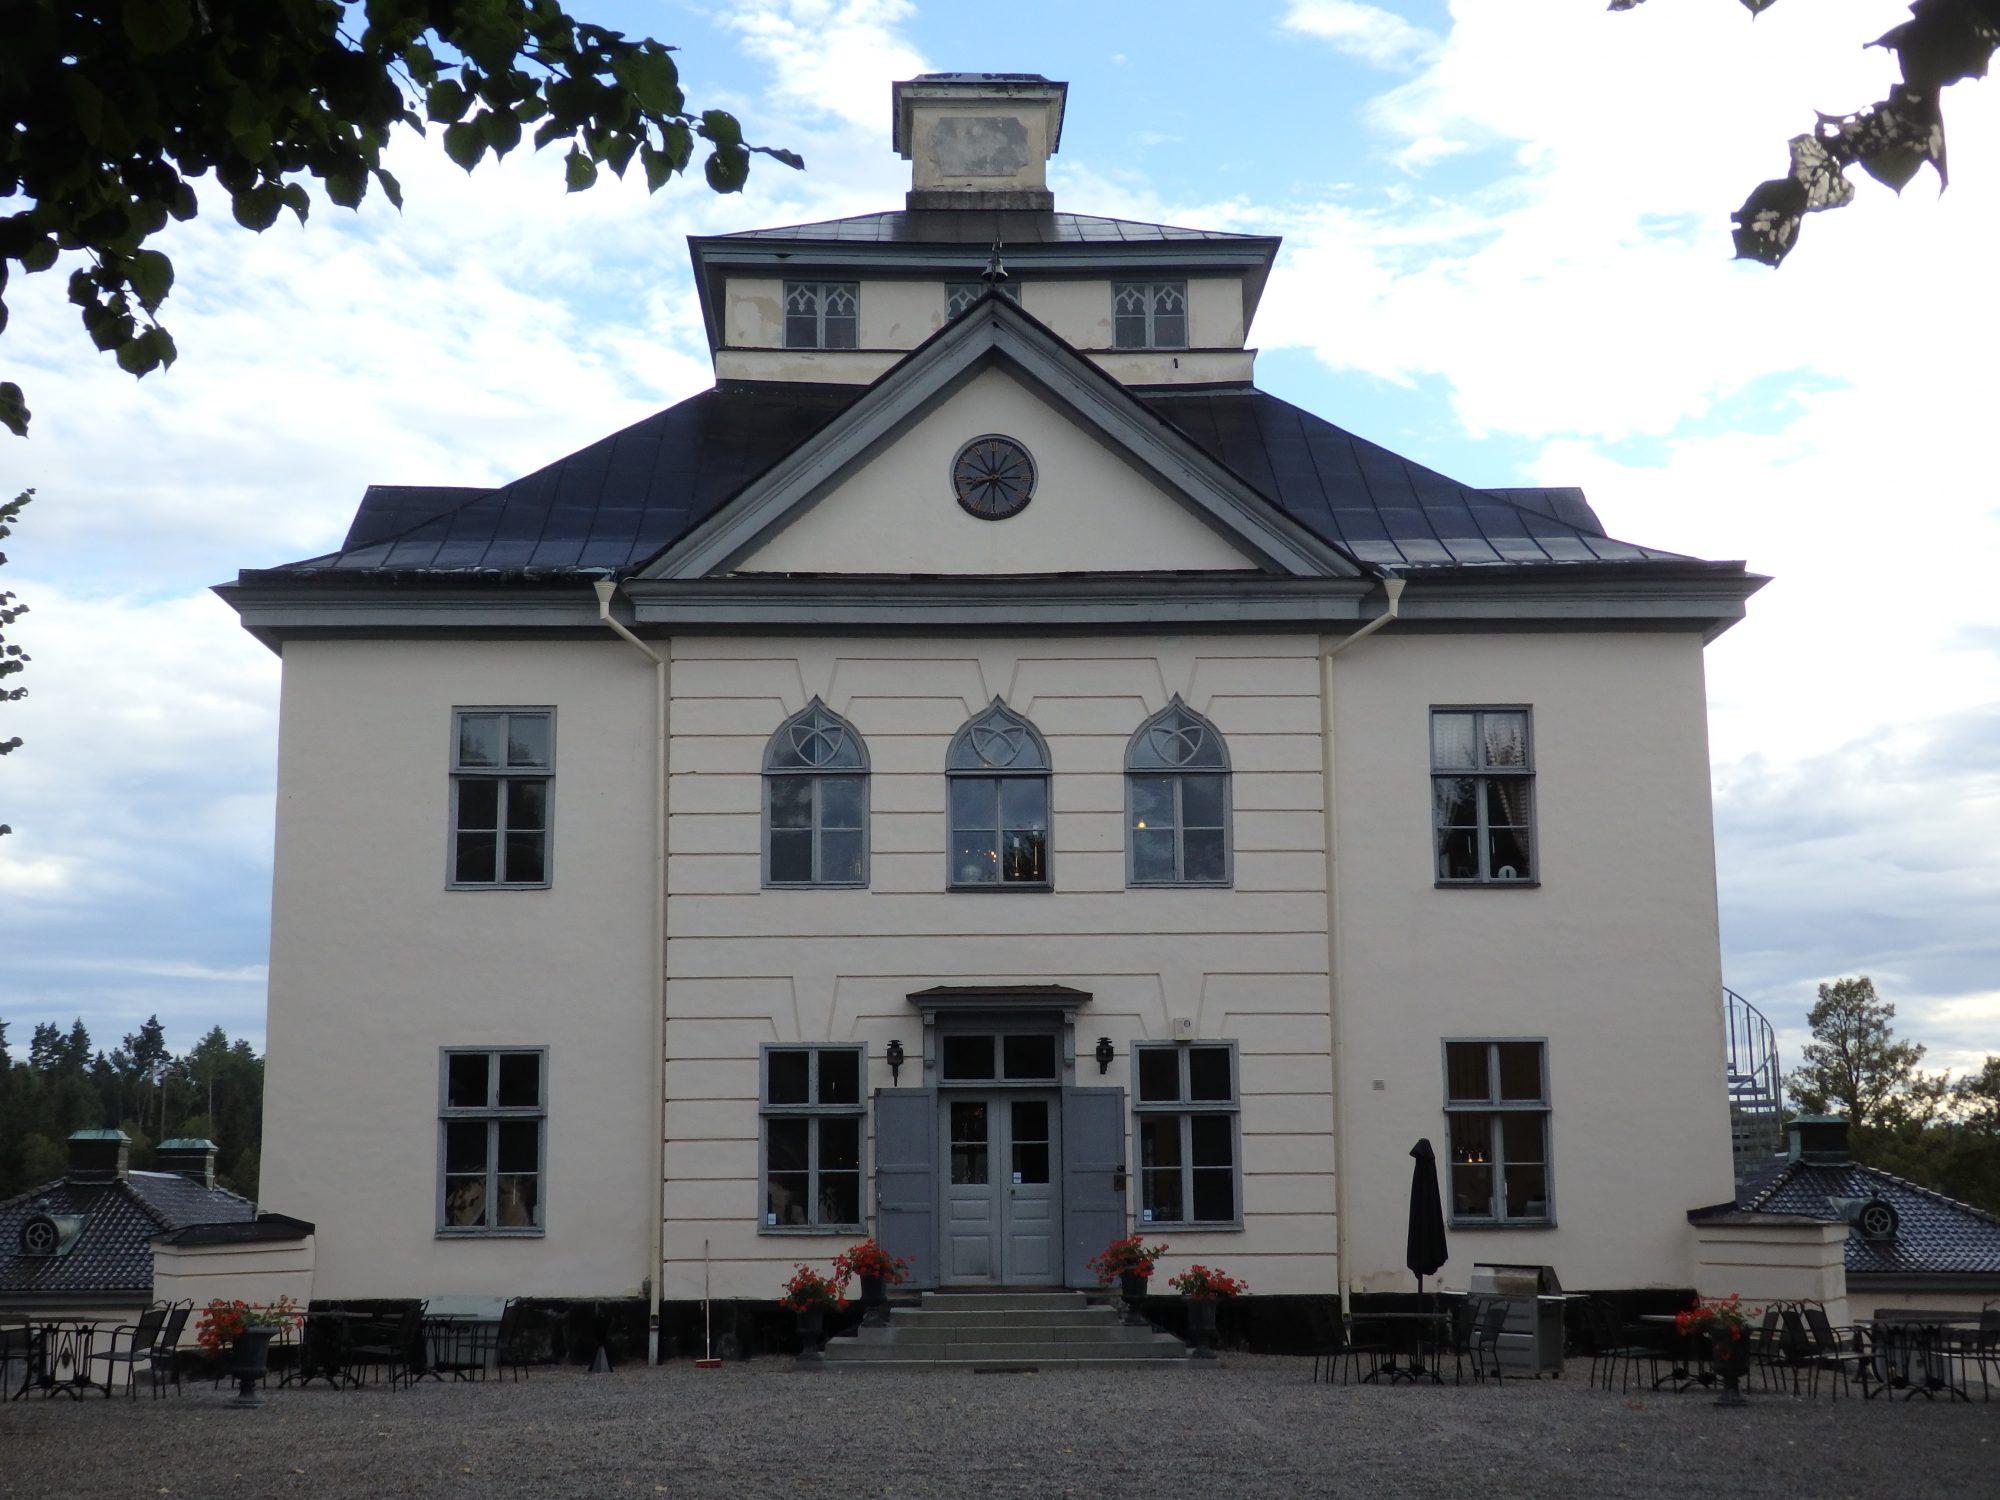 Öster Malma main house